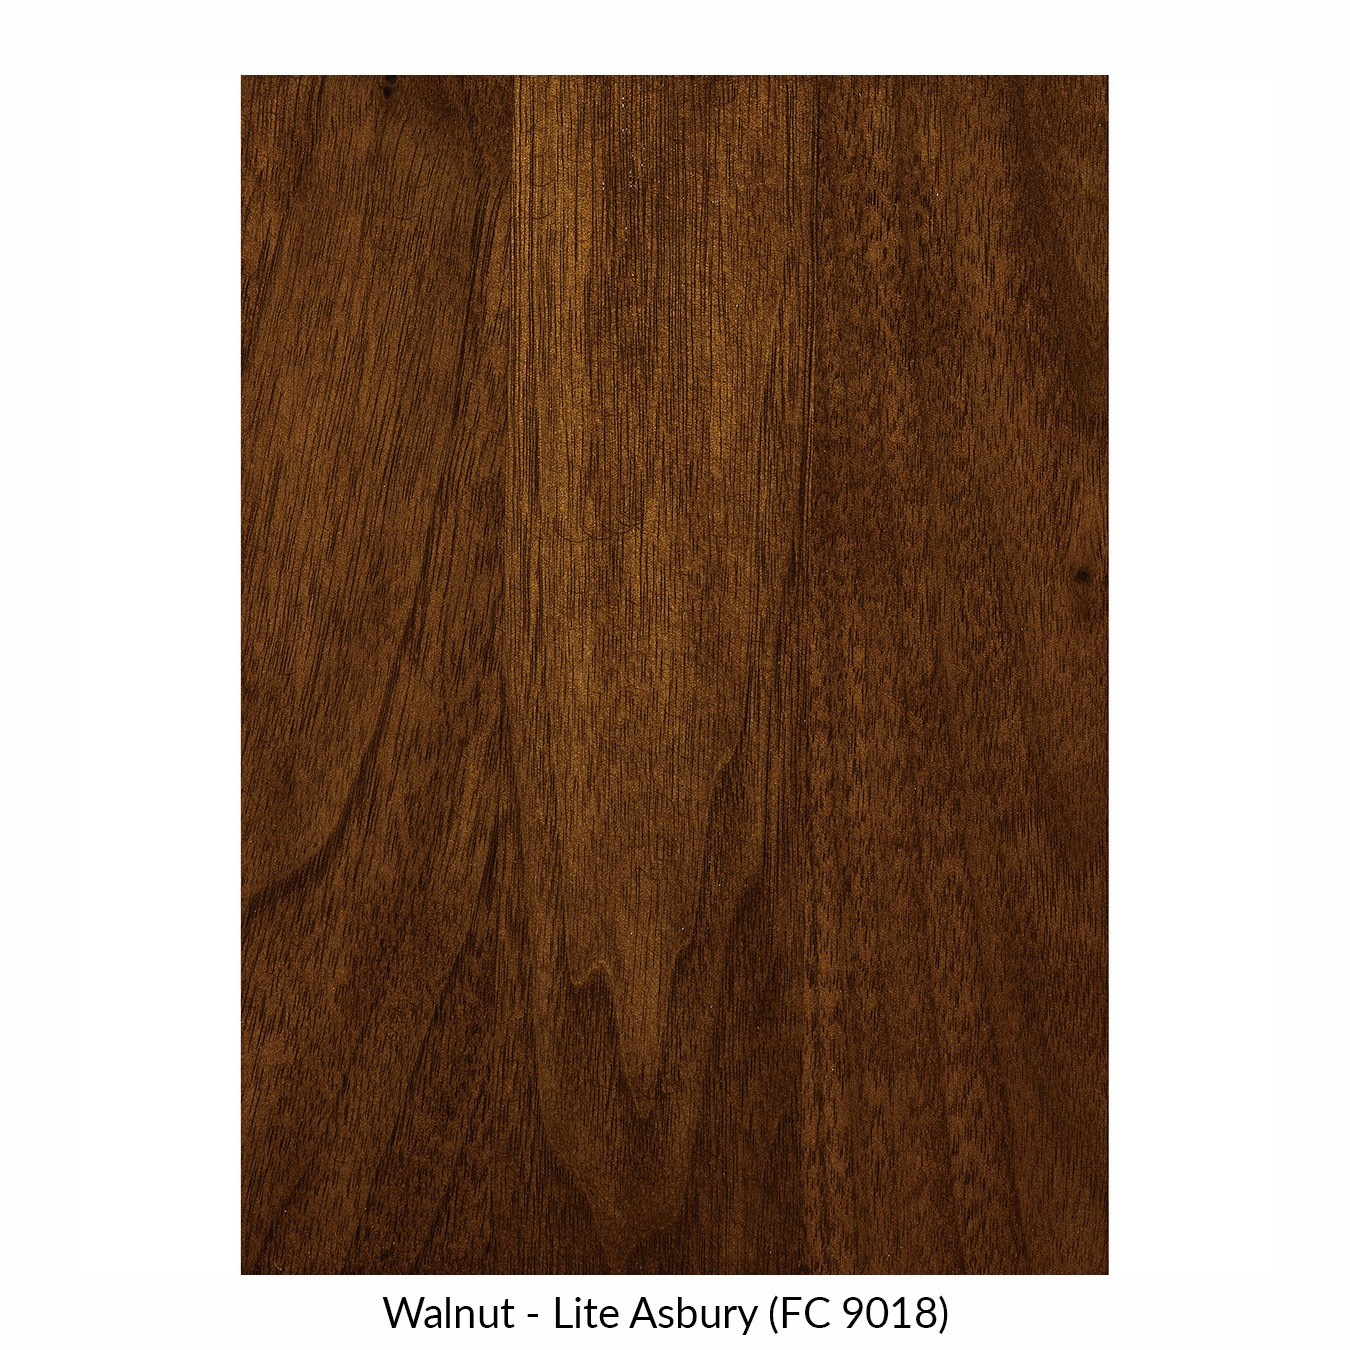 spectrum-walnut-lite-asbury-fc-9018.jpg